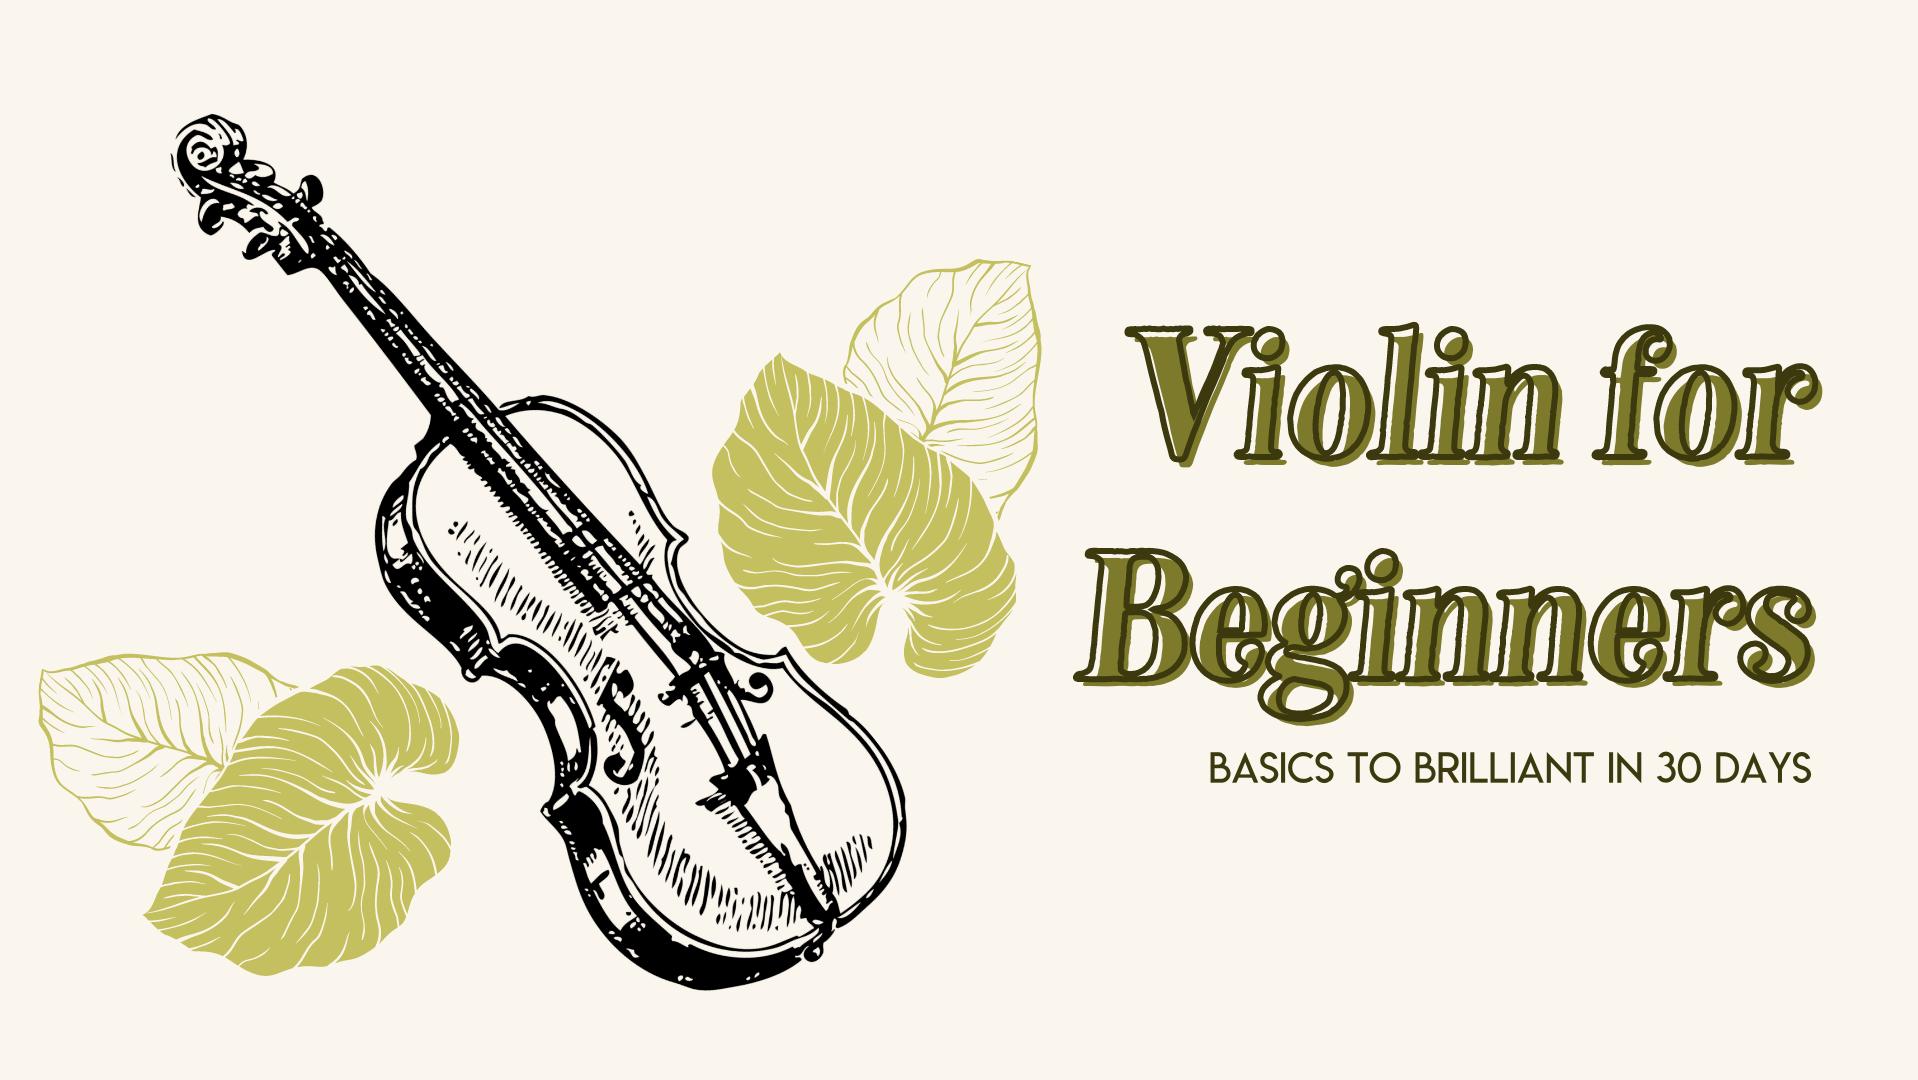 violin for beginners header image